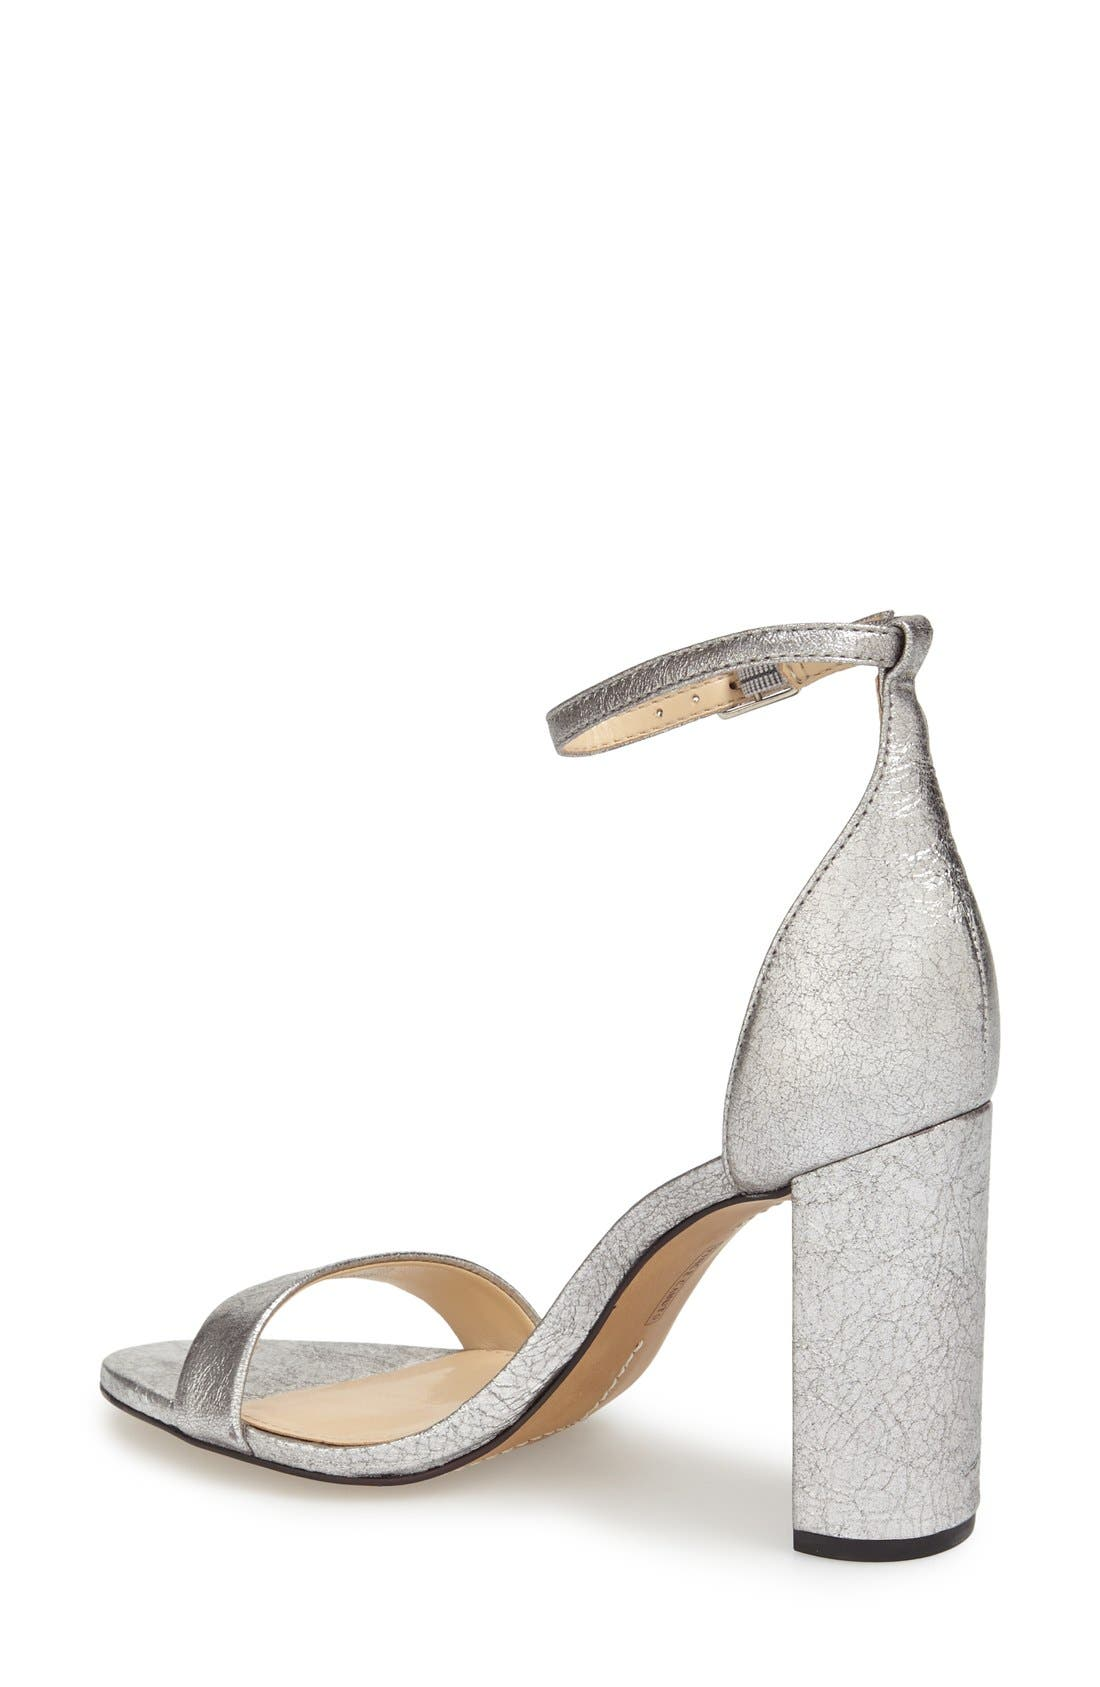 Alternate Image 2  - Vince Camuto 'Mairana' Ankle Strap Sandal (Women)